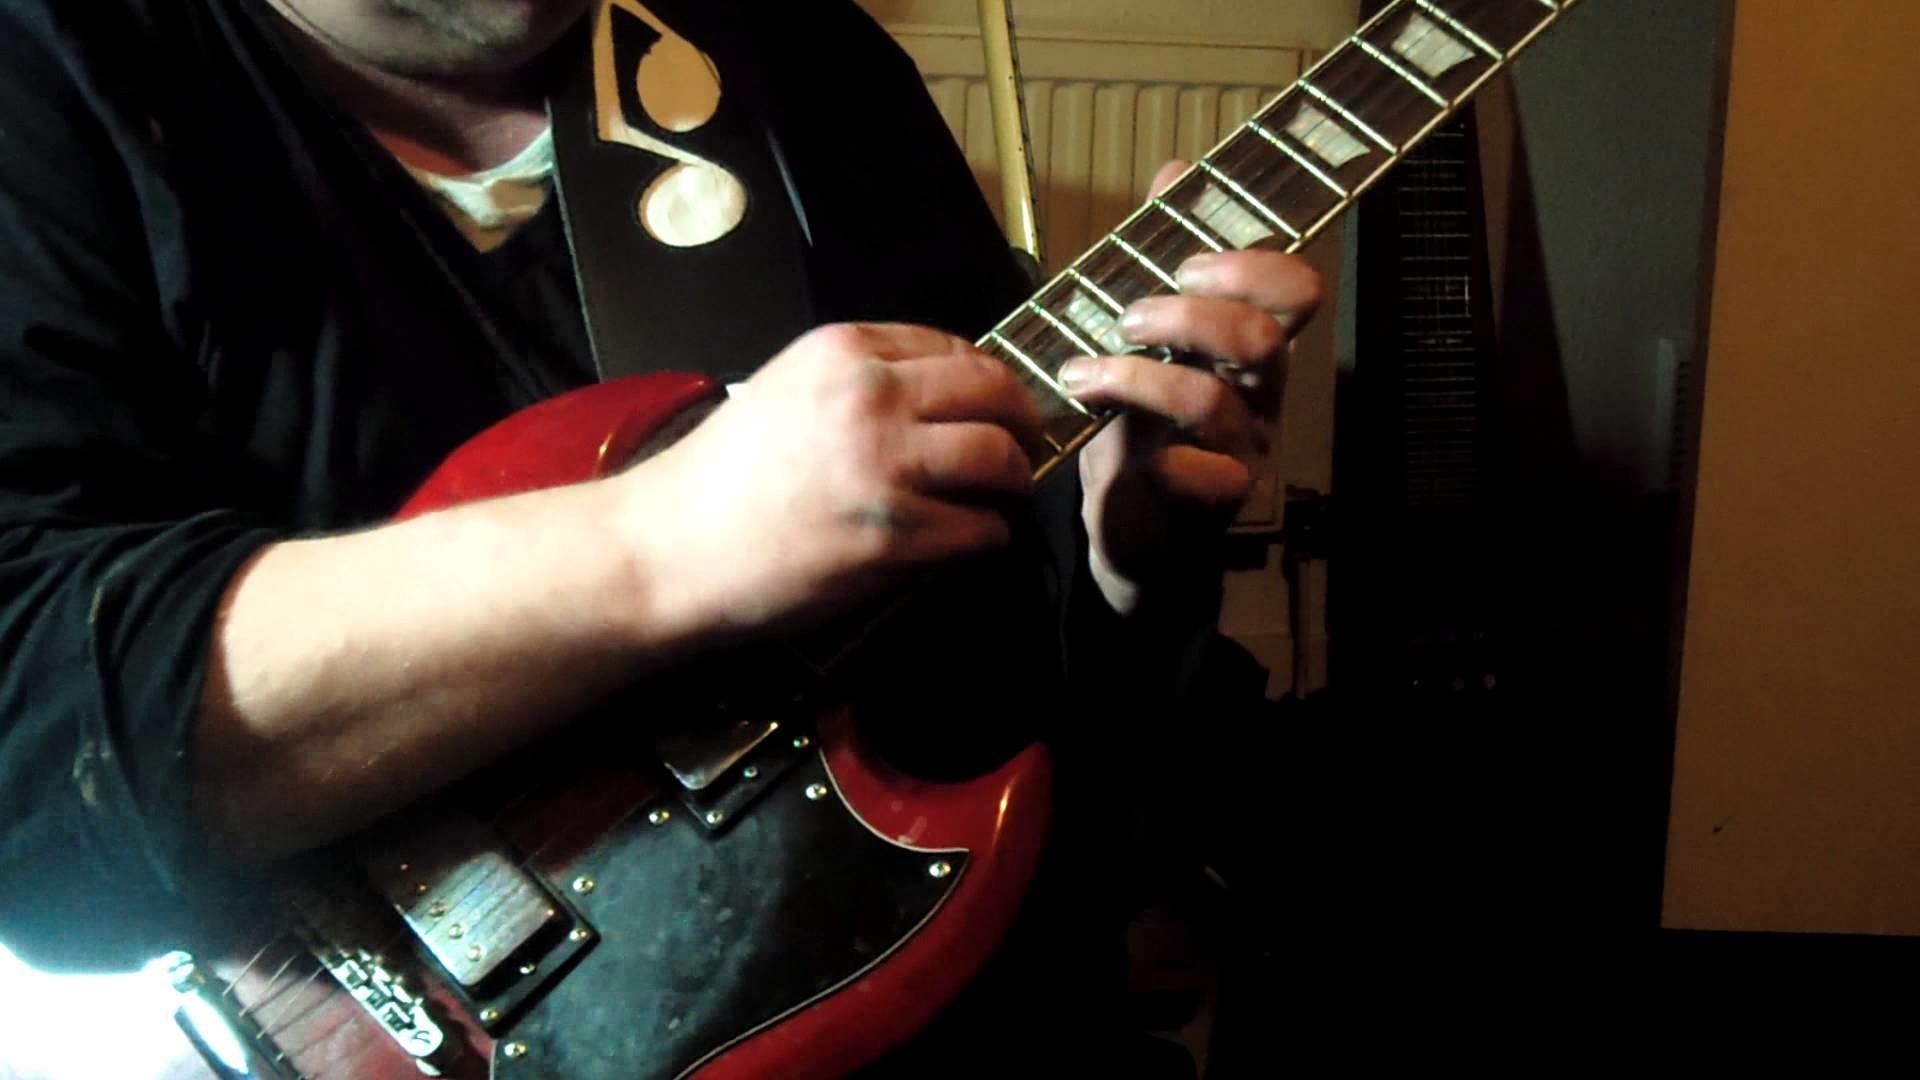 angus young style guitar solo improv on tokai sg